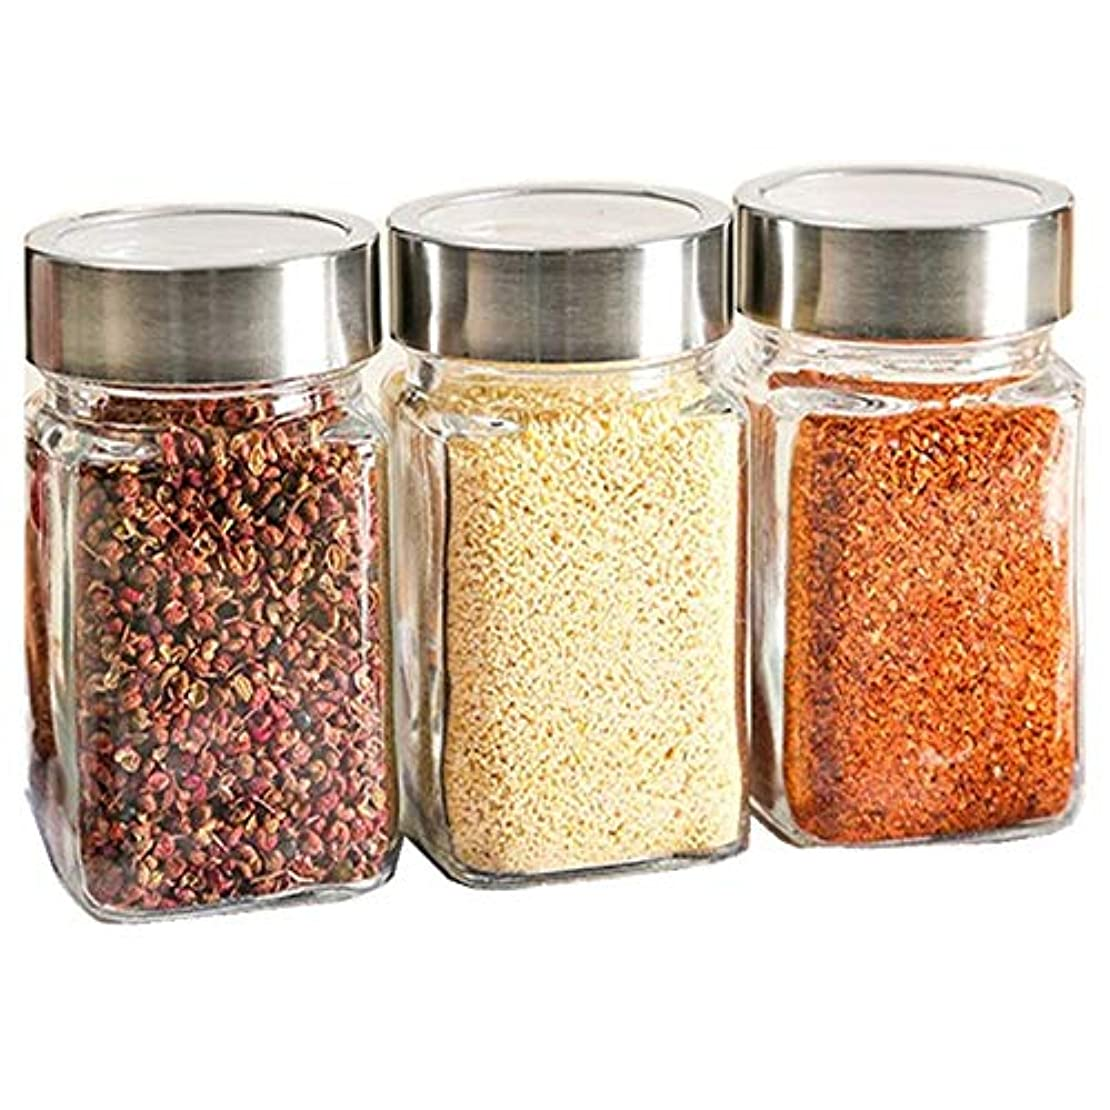 最近アンカー情緒的貯蔵瓶麦藁多目的貯蔵タンク台所用品